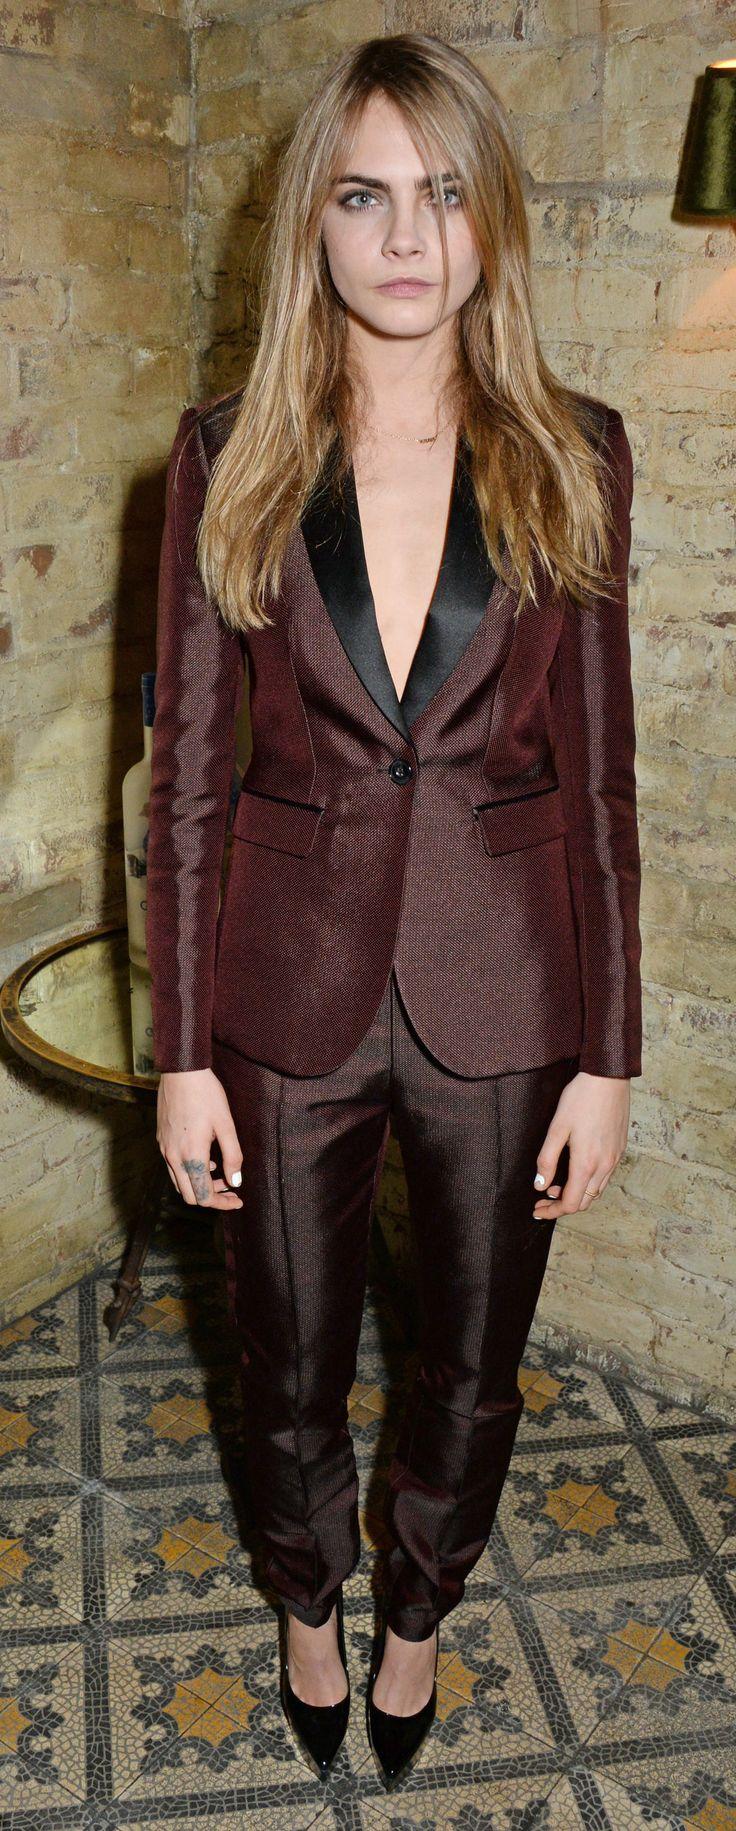 British model Cara Delevingne wearing Burberry tailoring at the Harvey Weinstein pre-BAFTA dinner in London